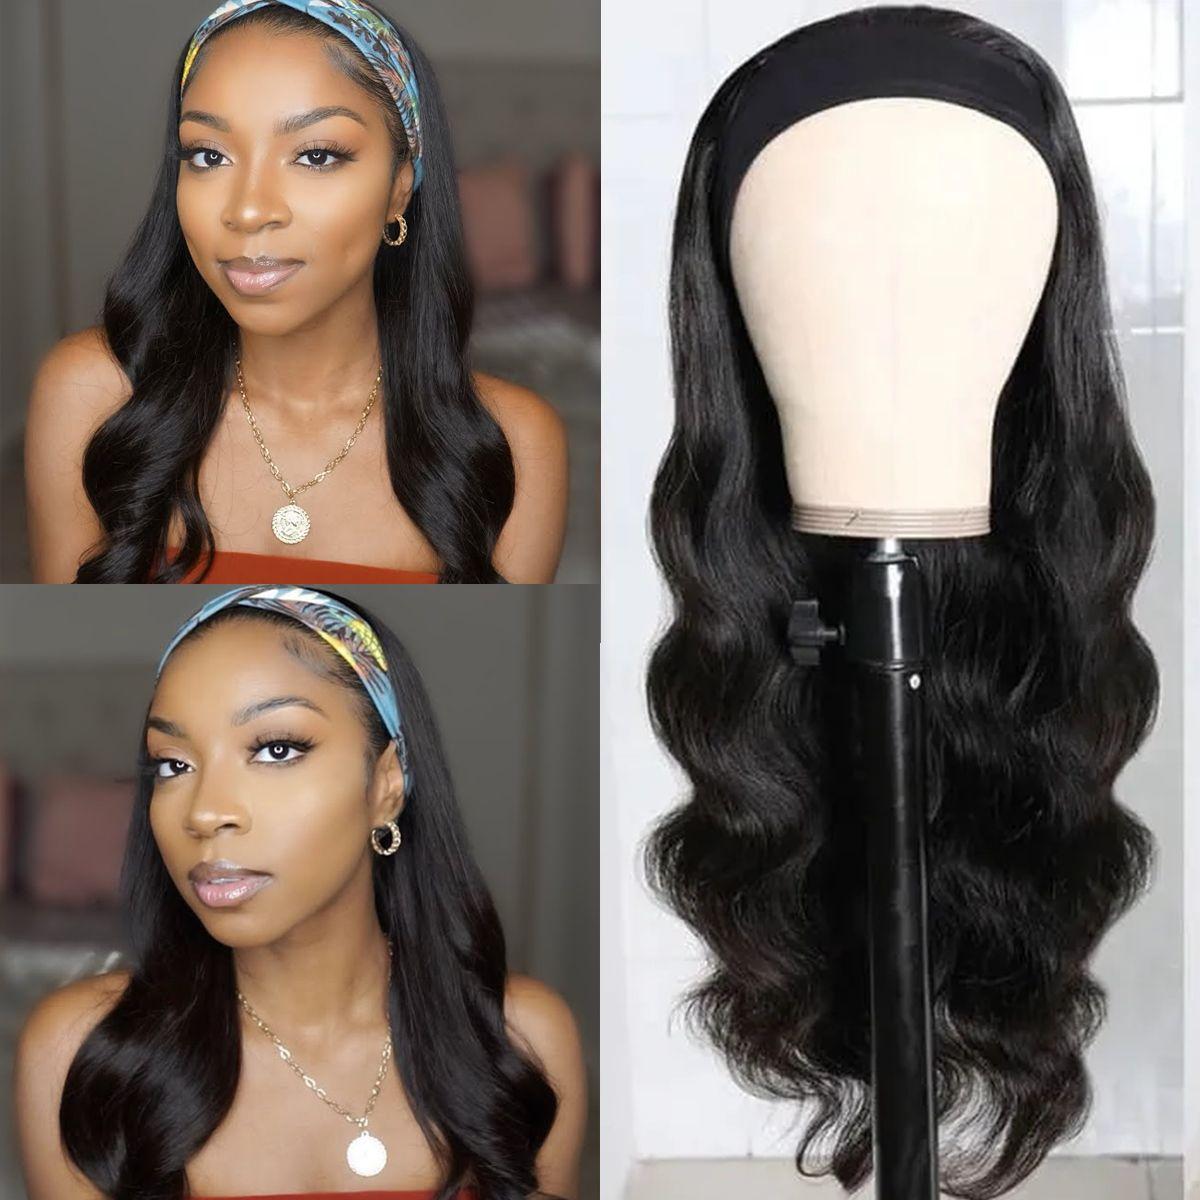 Body-wave-headband-wig-5